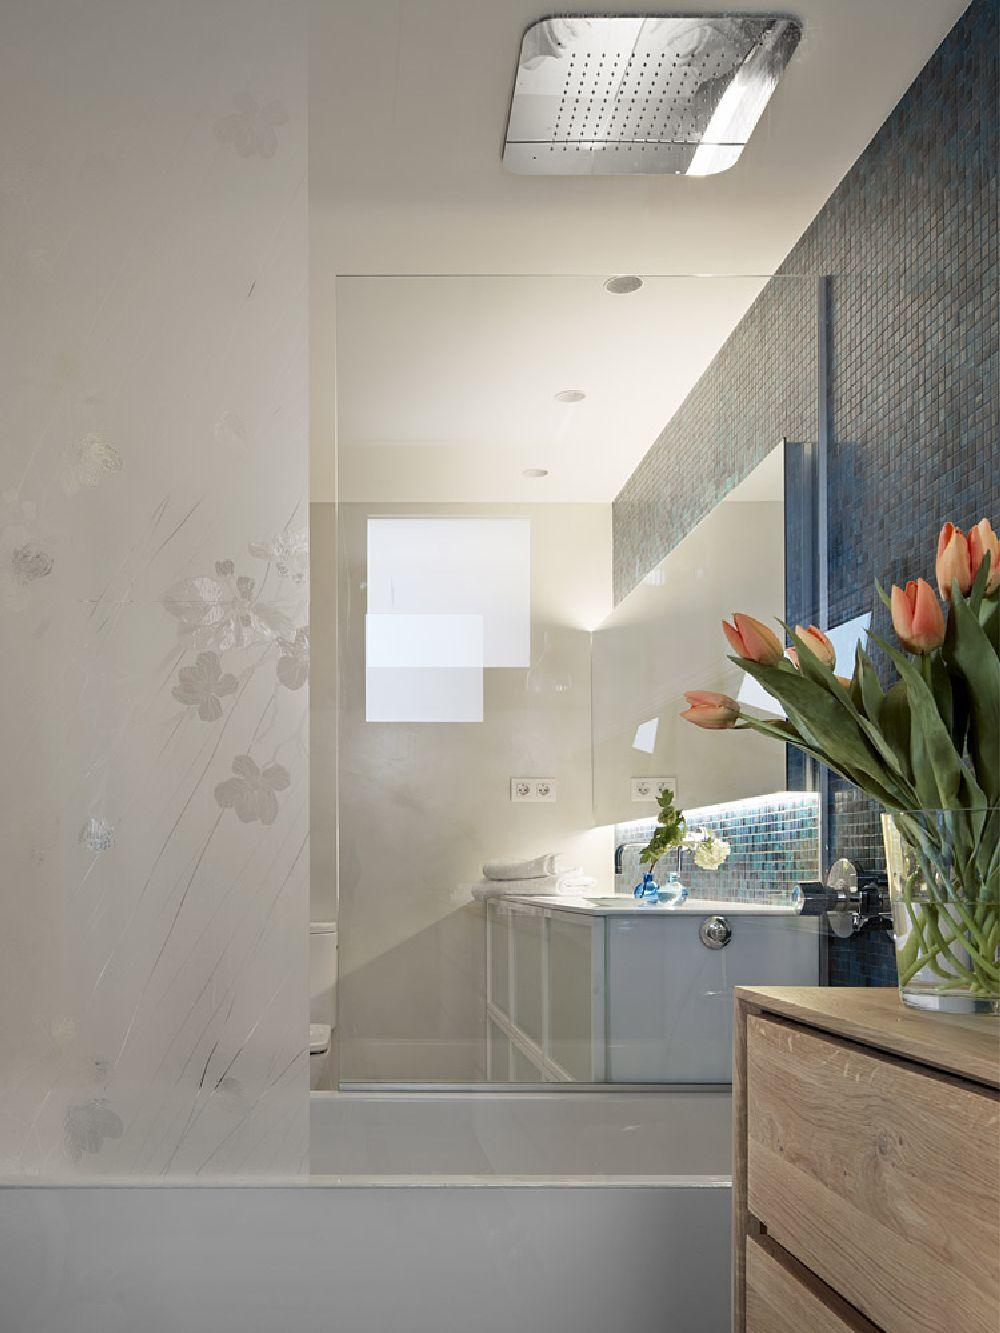 adelaparvu.com despre apartament cu aer mediteranean, design interior Meritxell Ribe (14)